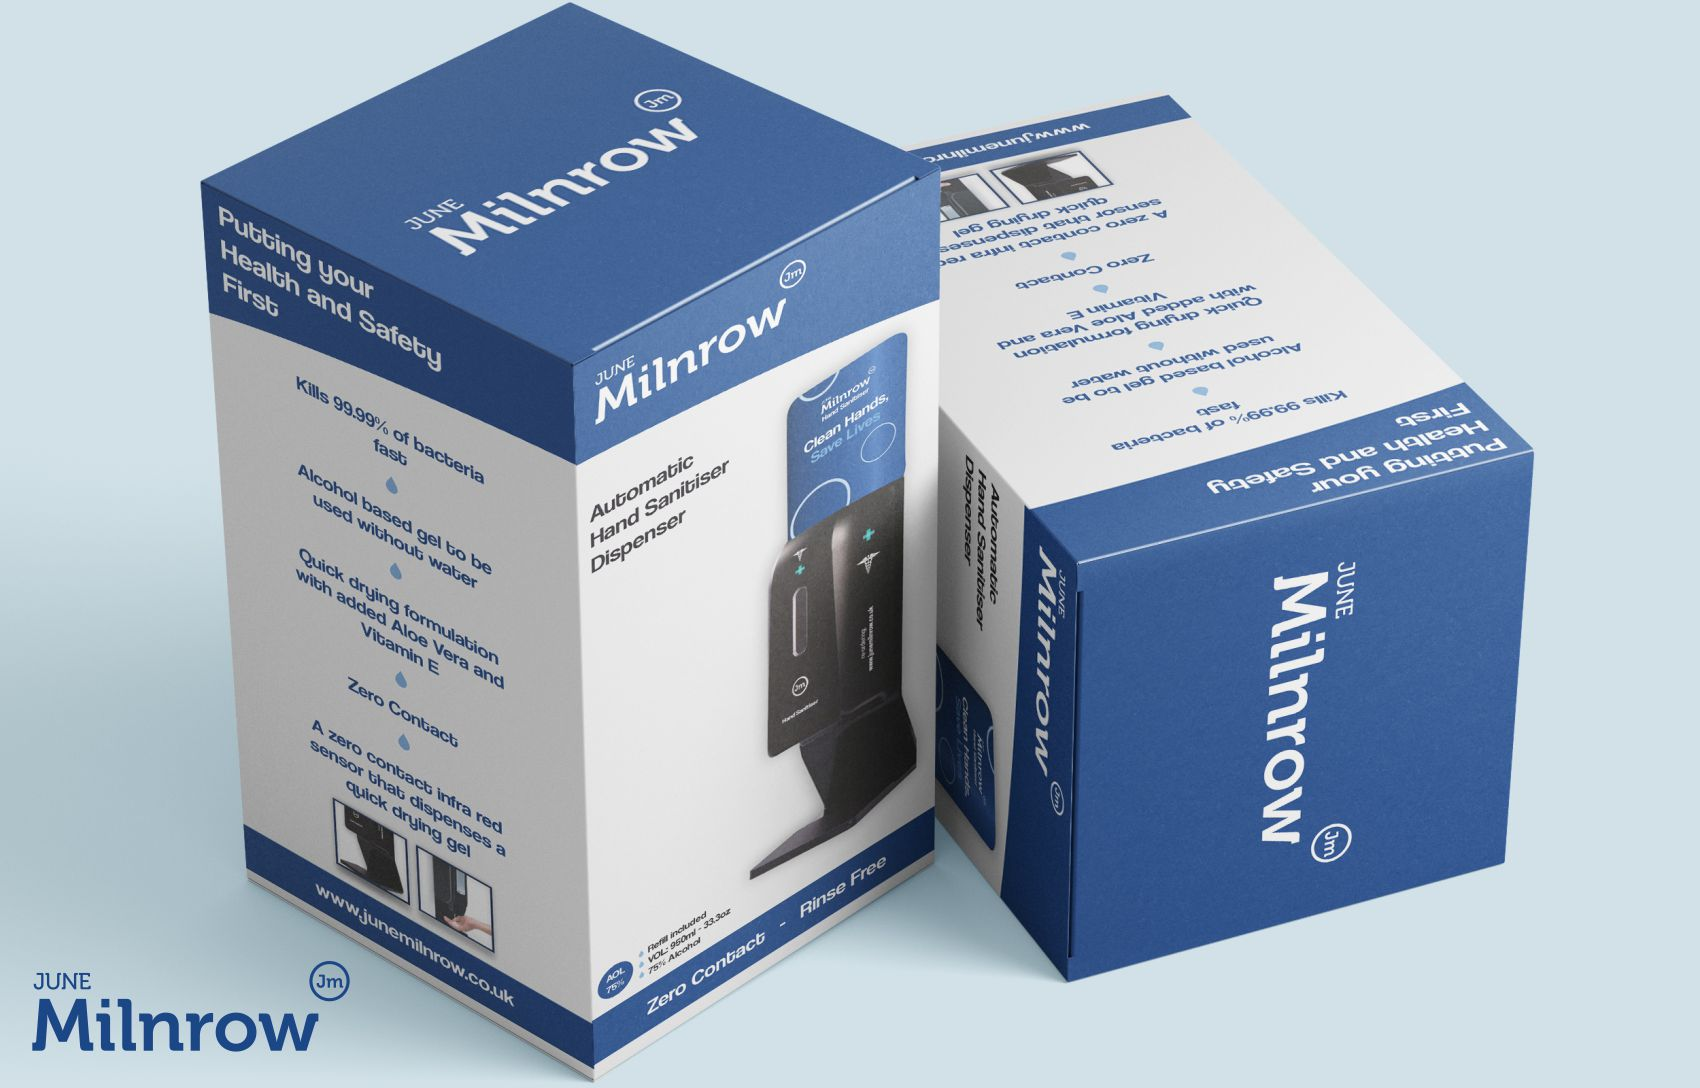 Packaging-Design-Mockup-June_milnrow